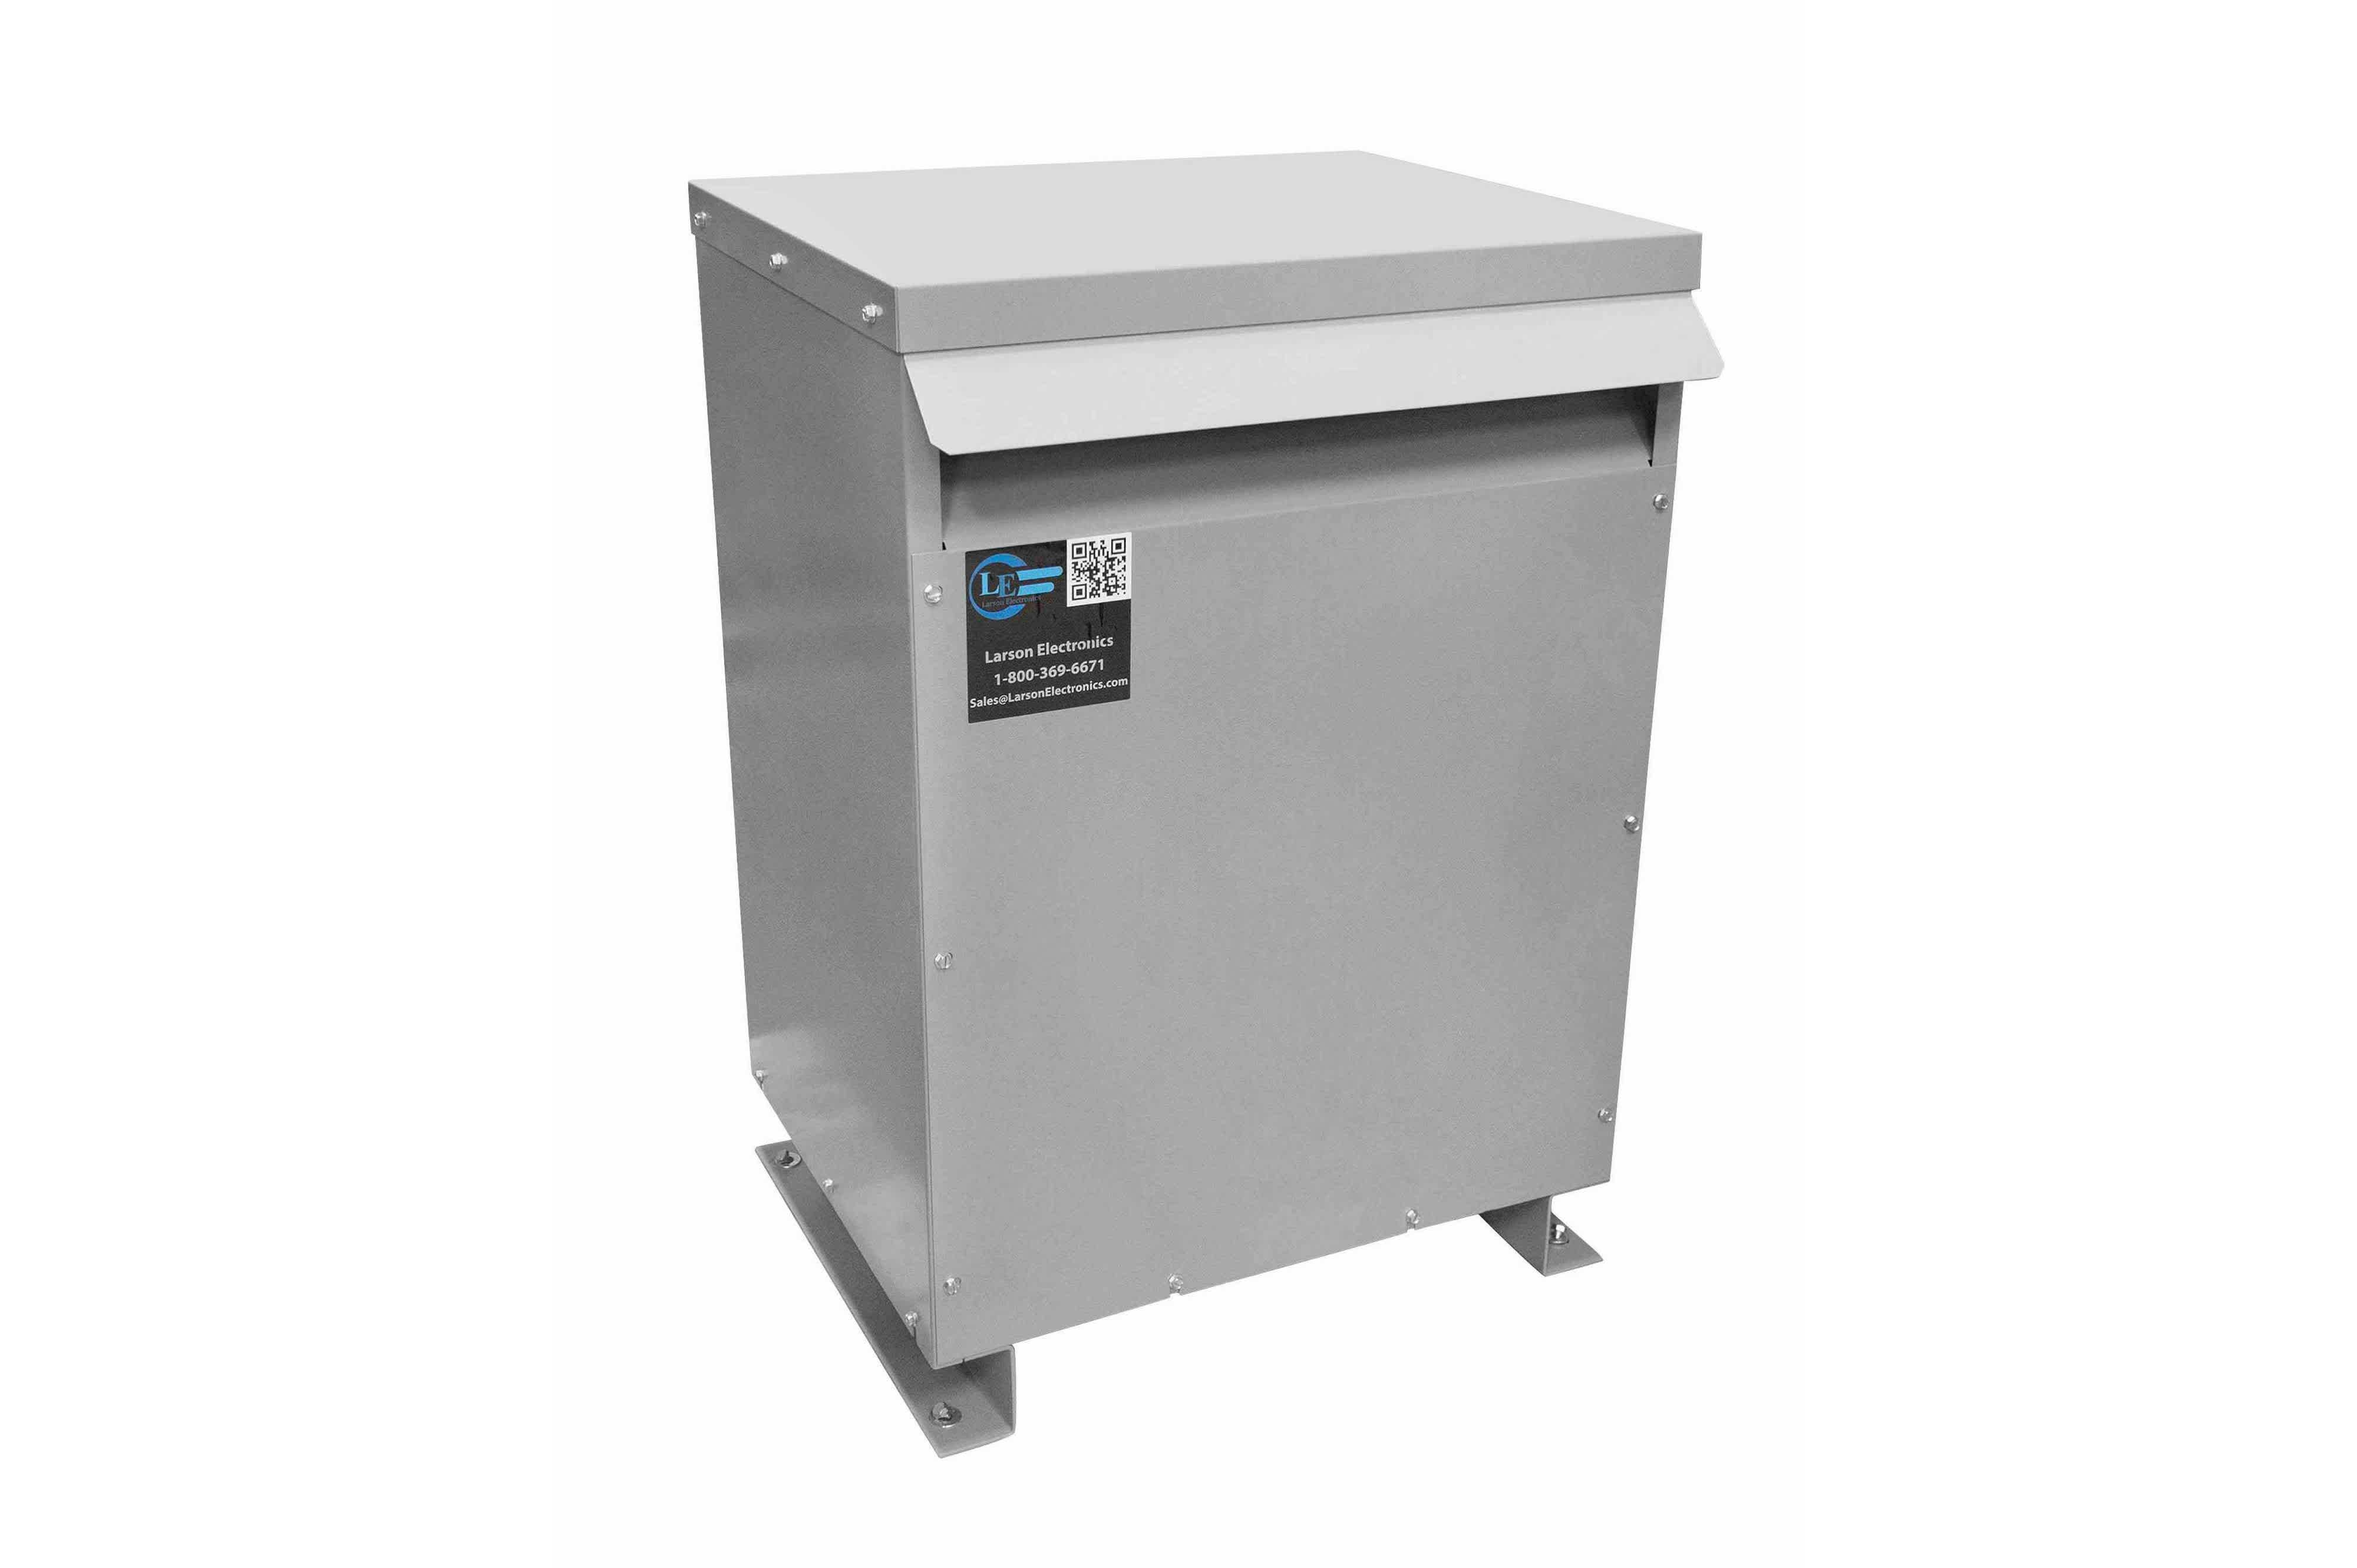 22.5 kVA 3PH Isolation Transformer, 480V Wye Primary, 600V Delta Secondary, N3R, Ventilated, 60 Hz